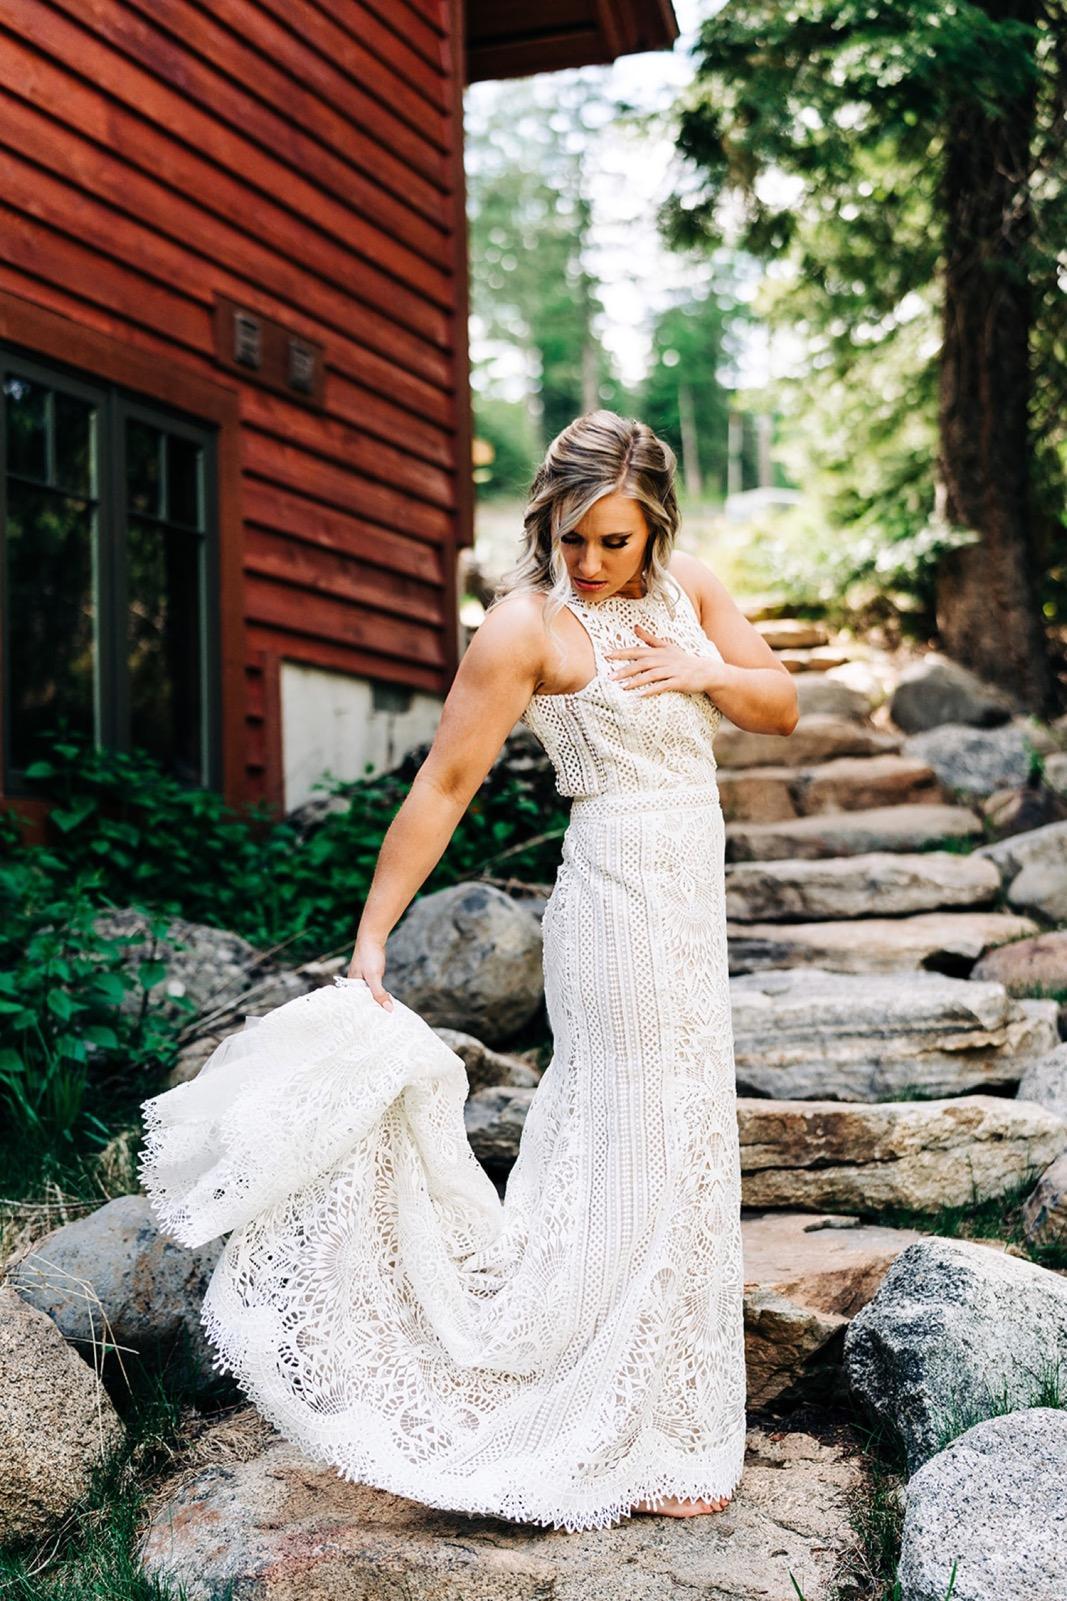 015_falissa_heather_wedding-39.jpg